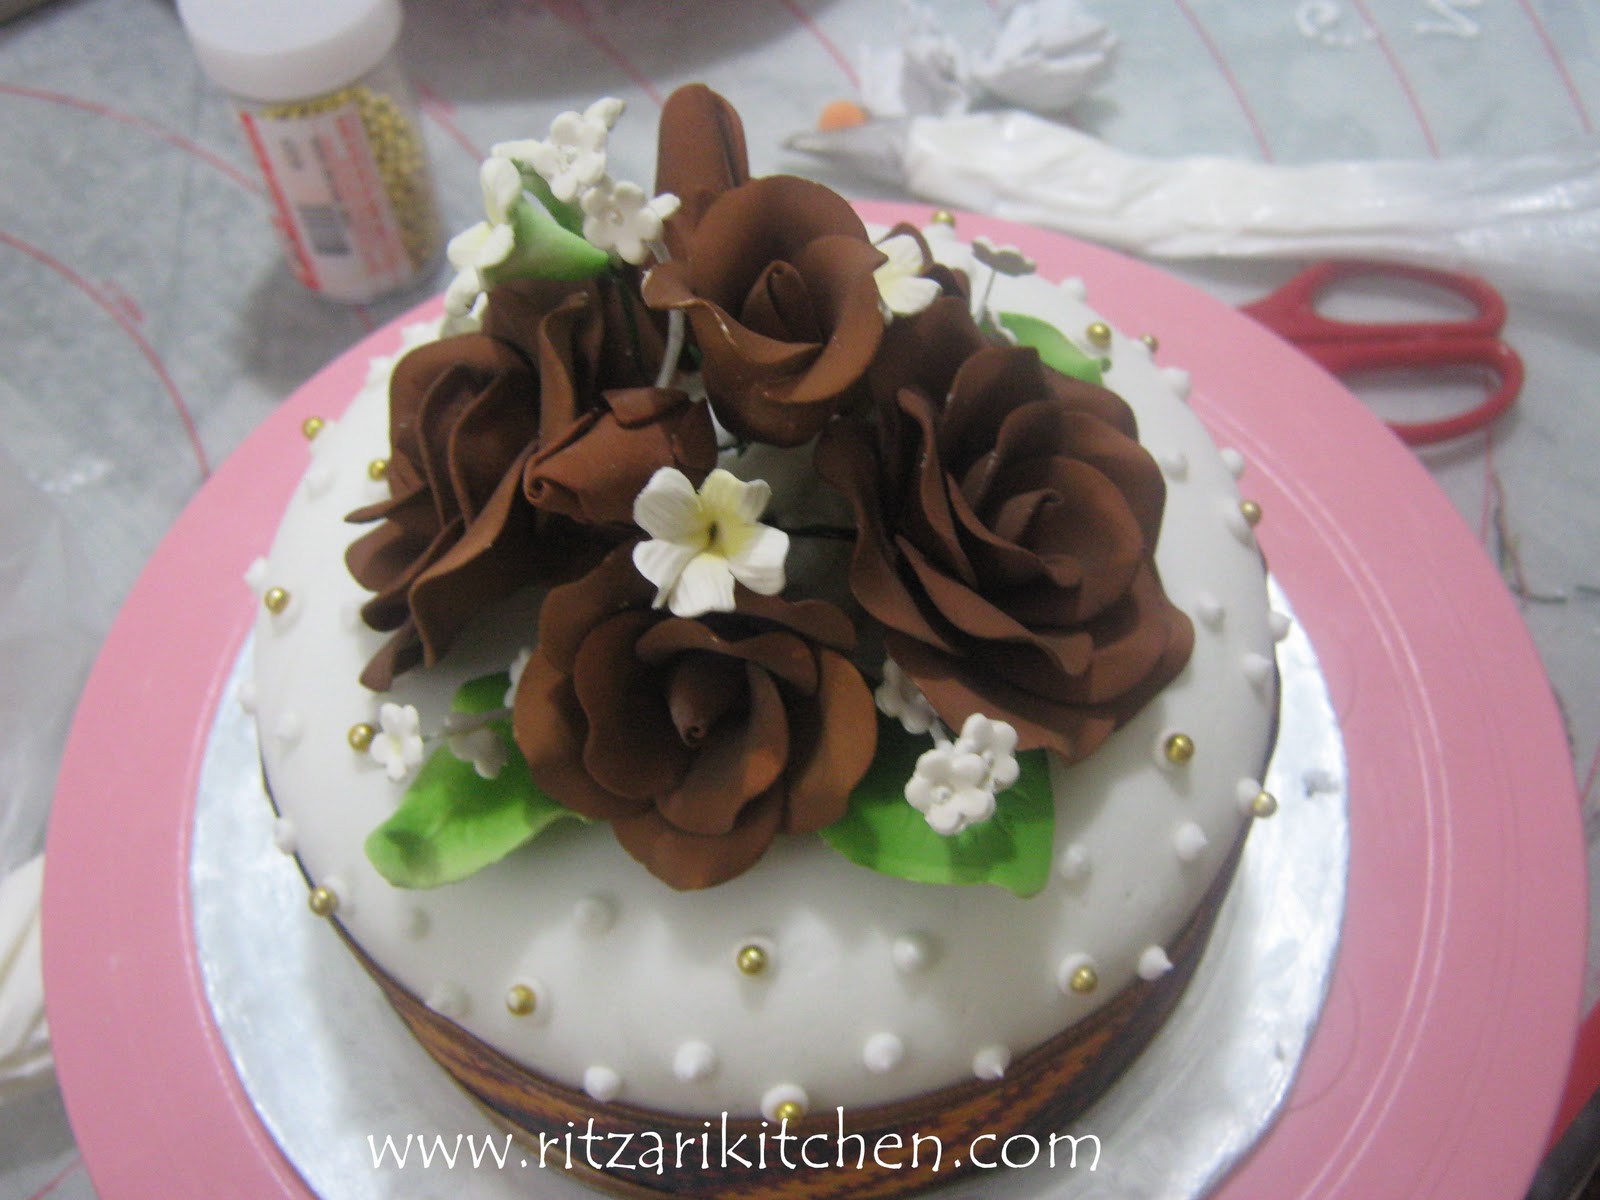 Pin Ritzarikitchen A Few Cake Decorating Ideas For The